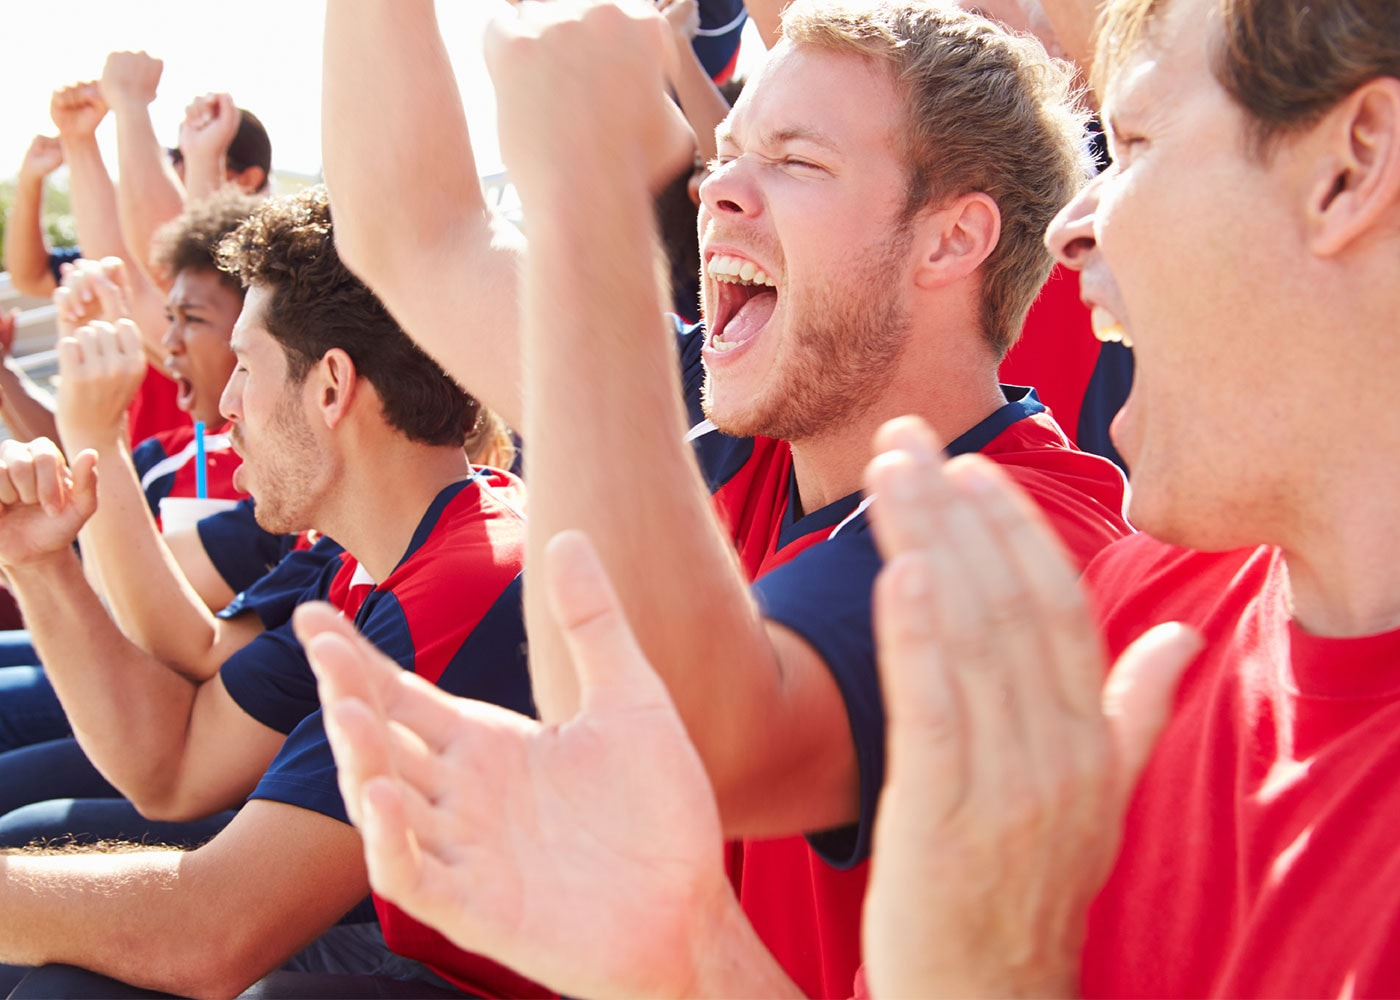 Publikum bei Sportevents fotografieren